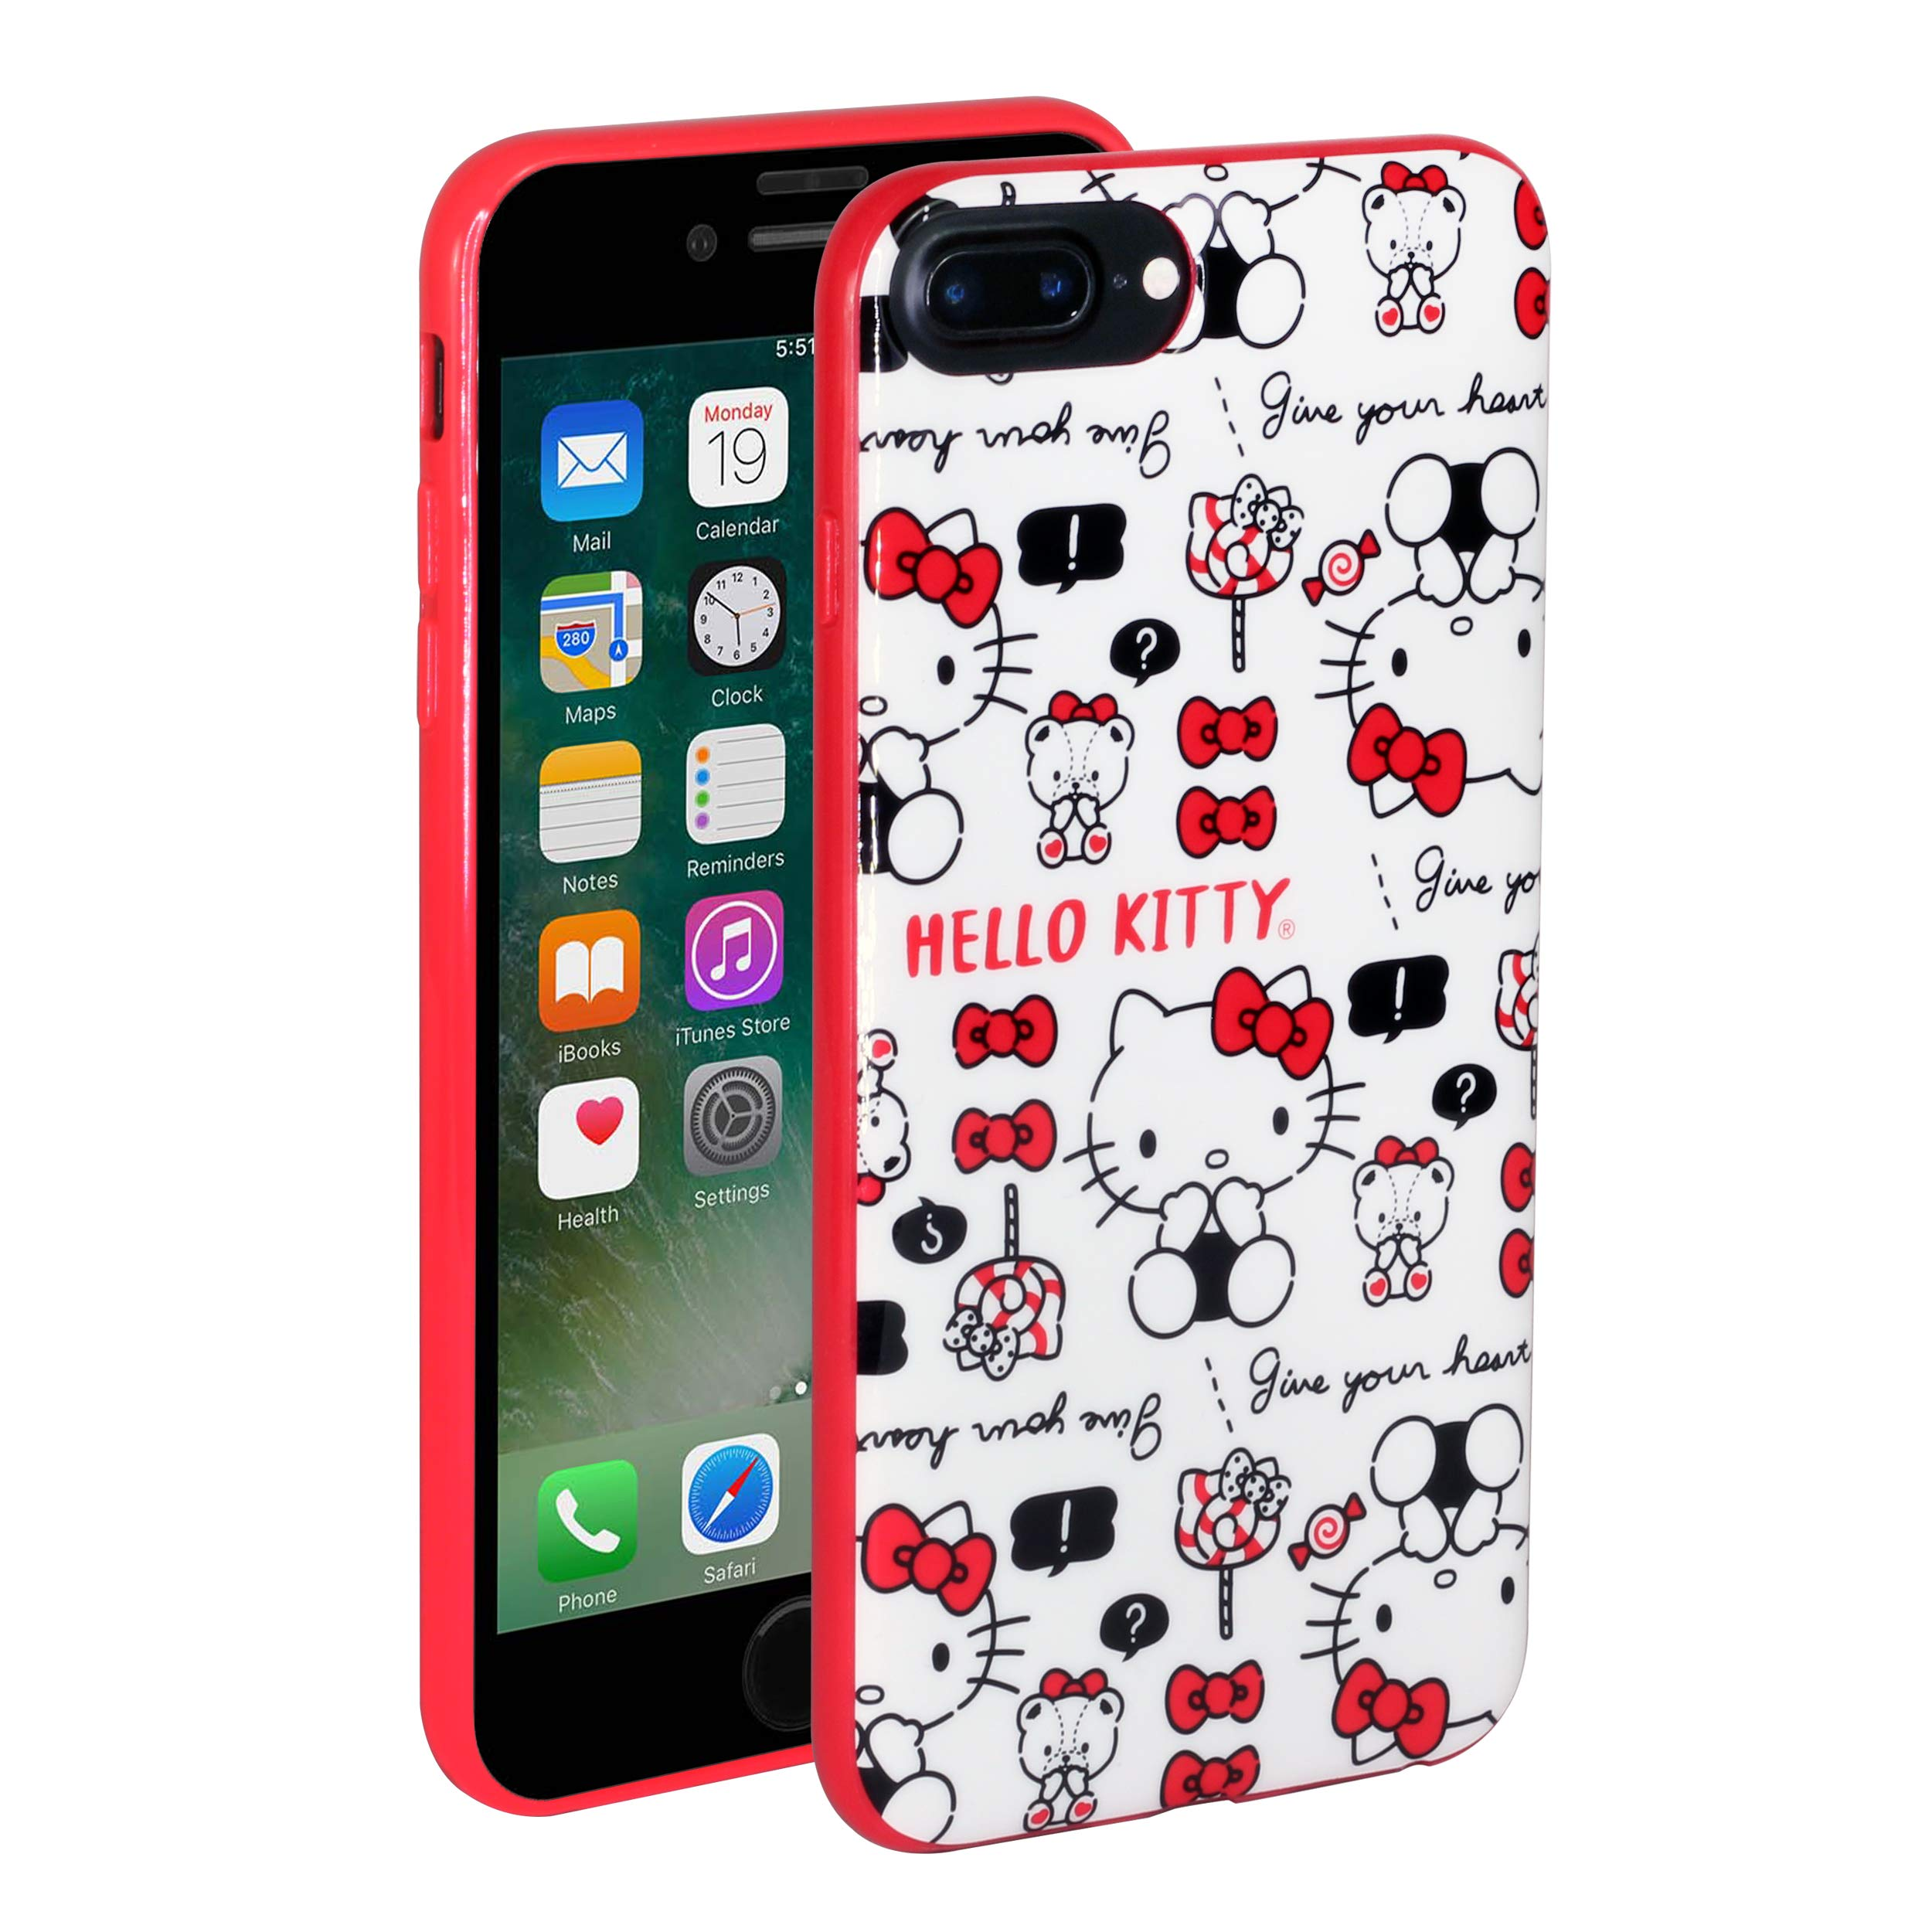 e2b9848f4 Hello Kitty iPhone Case for iPhone 7 Plus / 8 Plus - Slip On TPU Case